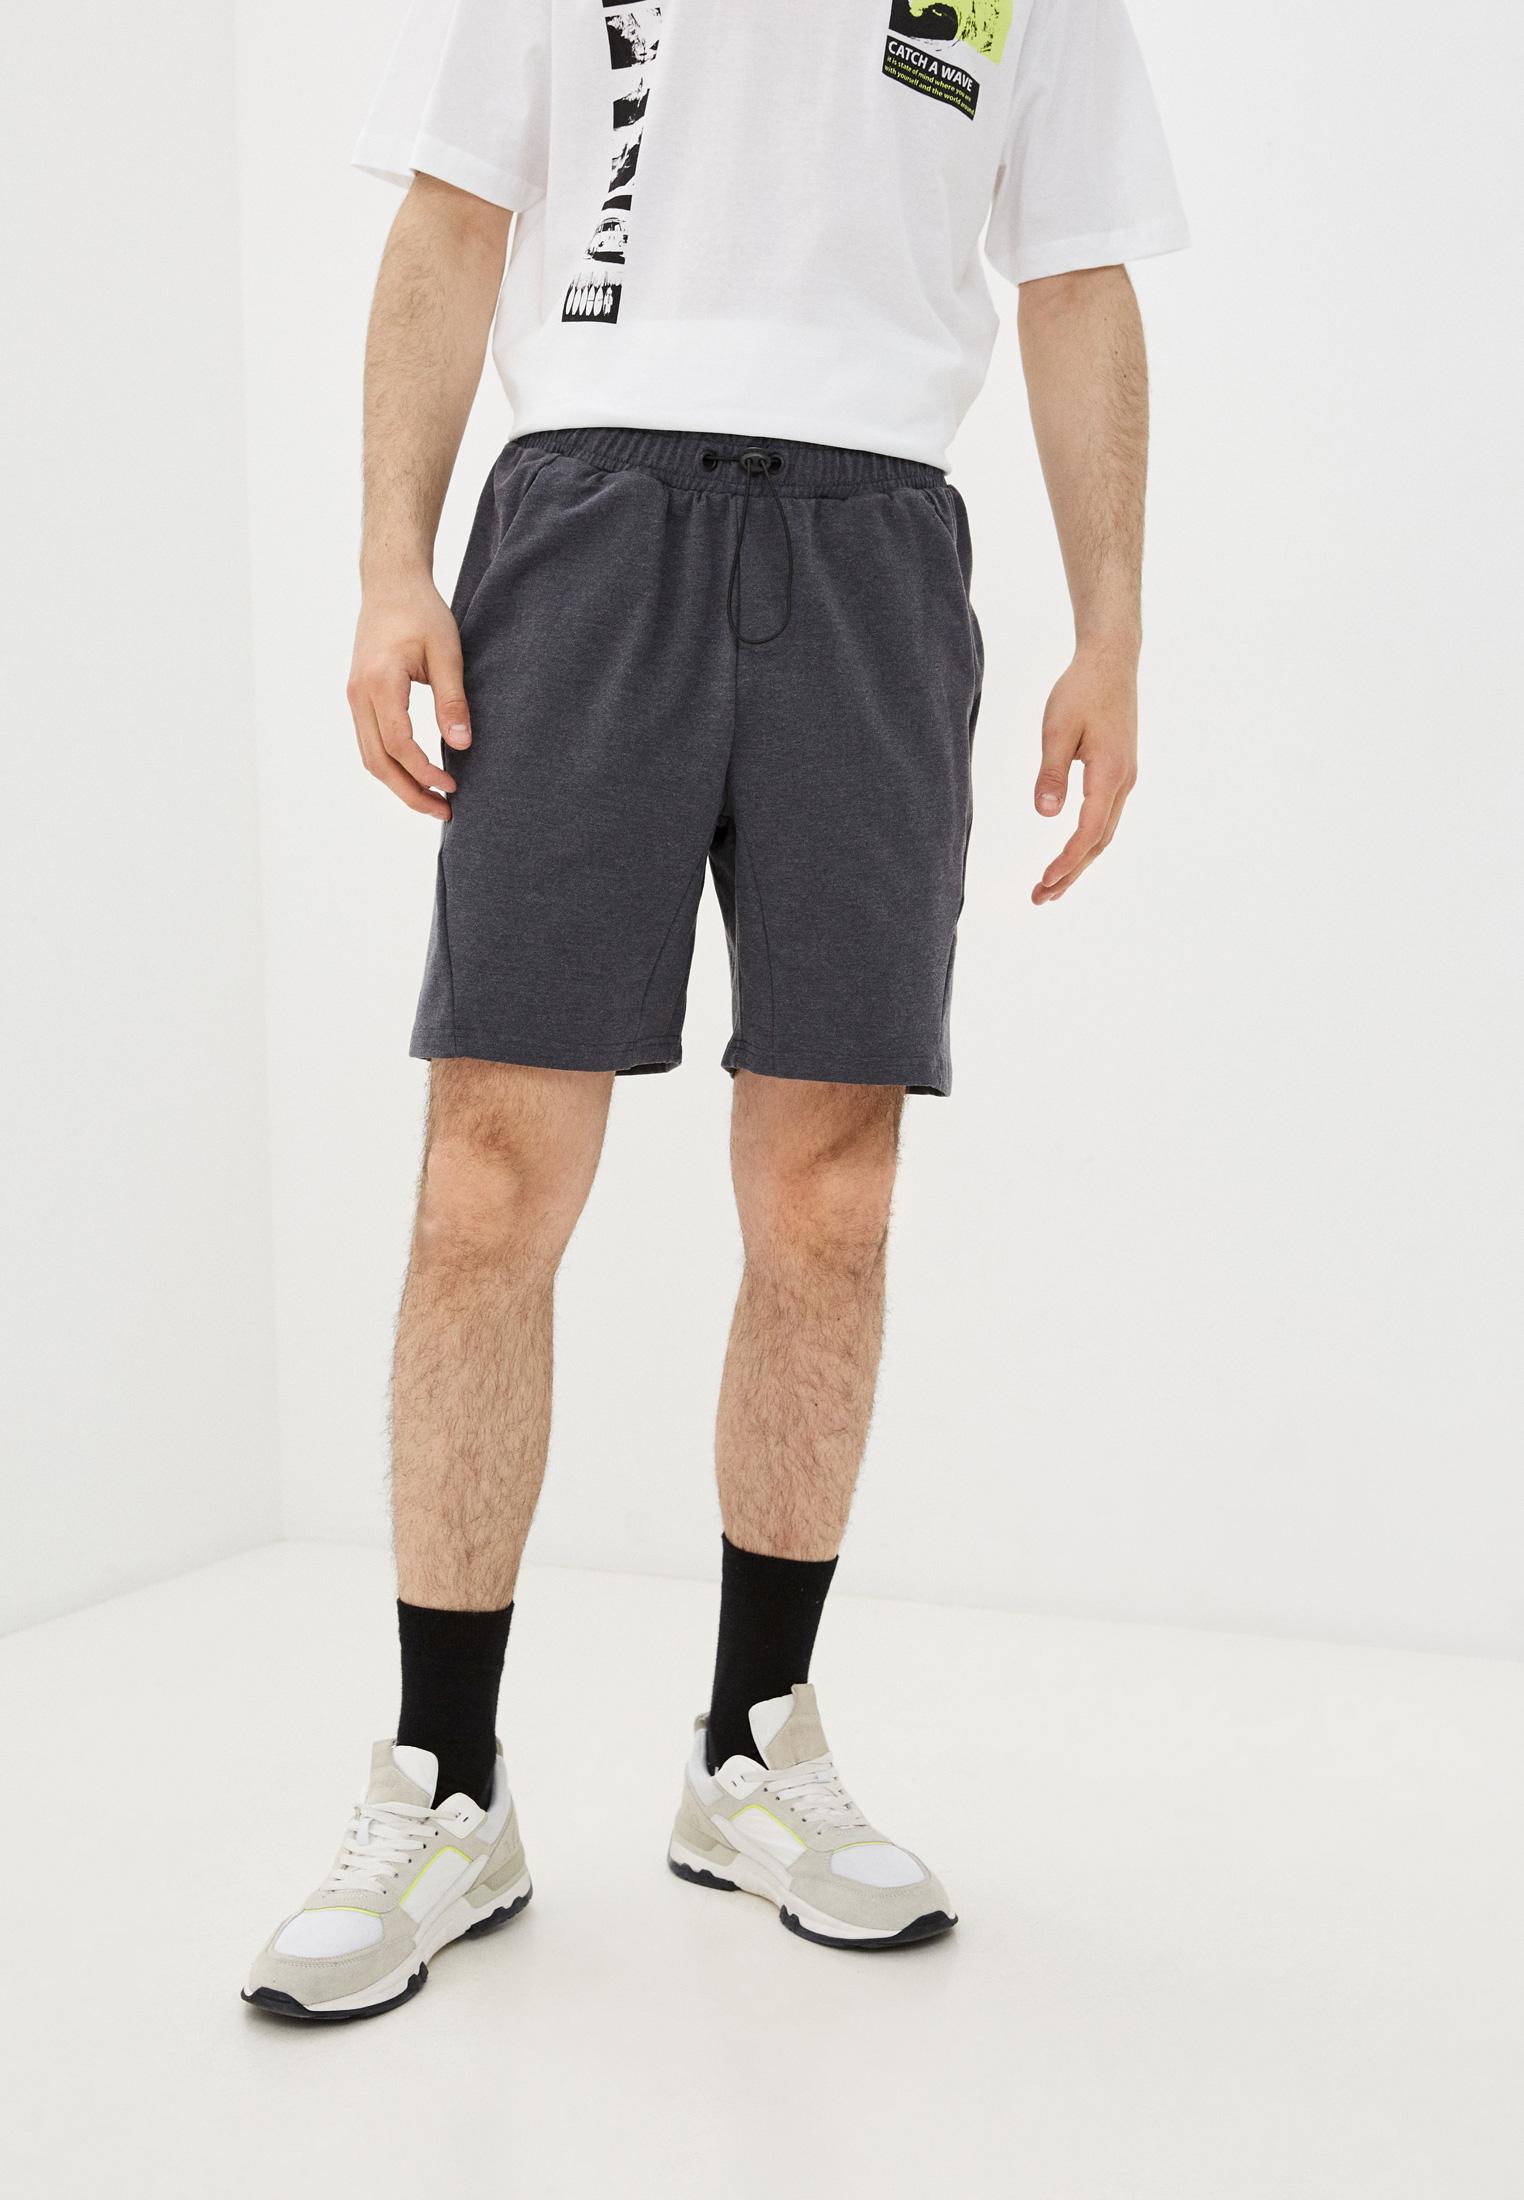 Мужские спортивные шорты Outhorn HOL21-SKMD607